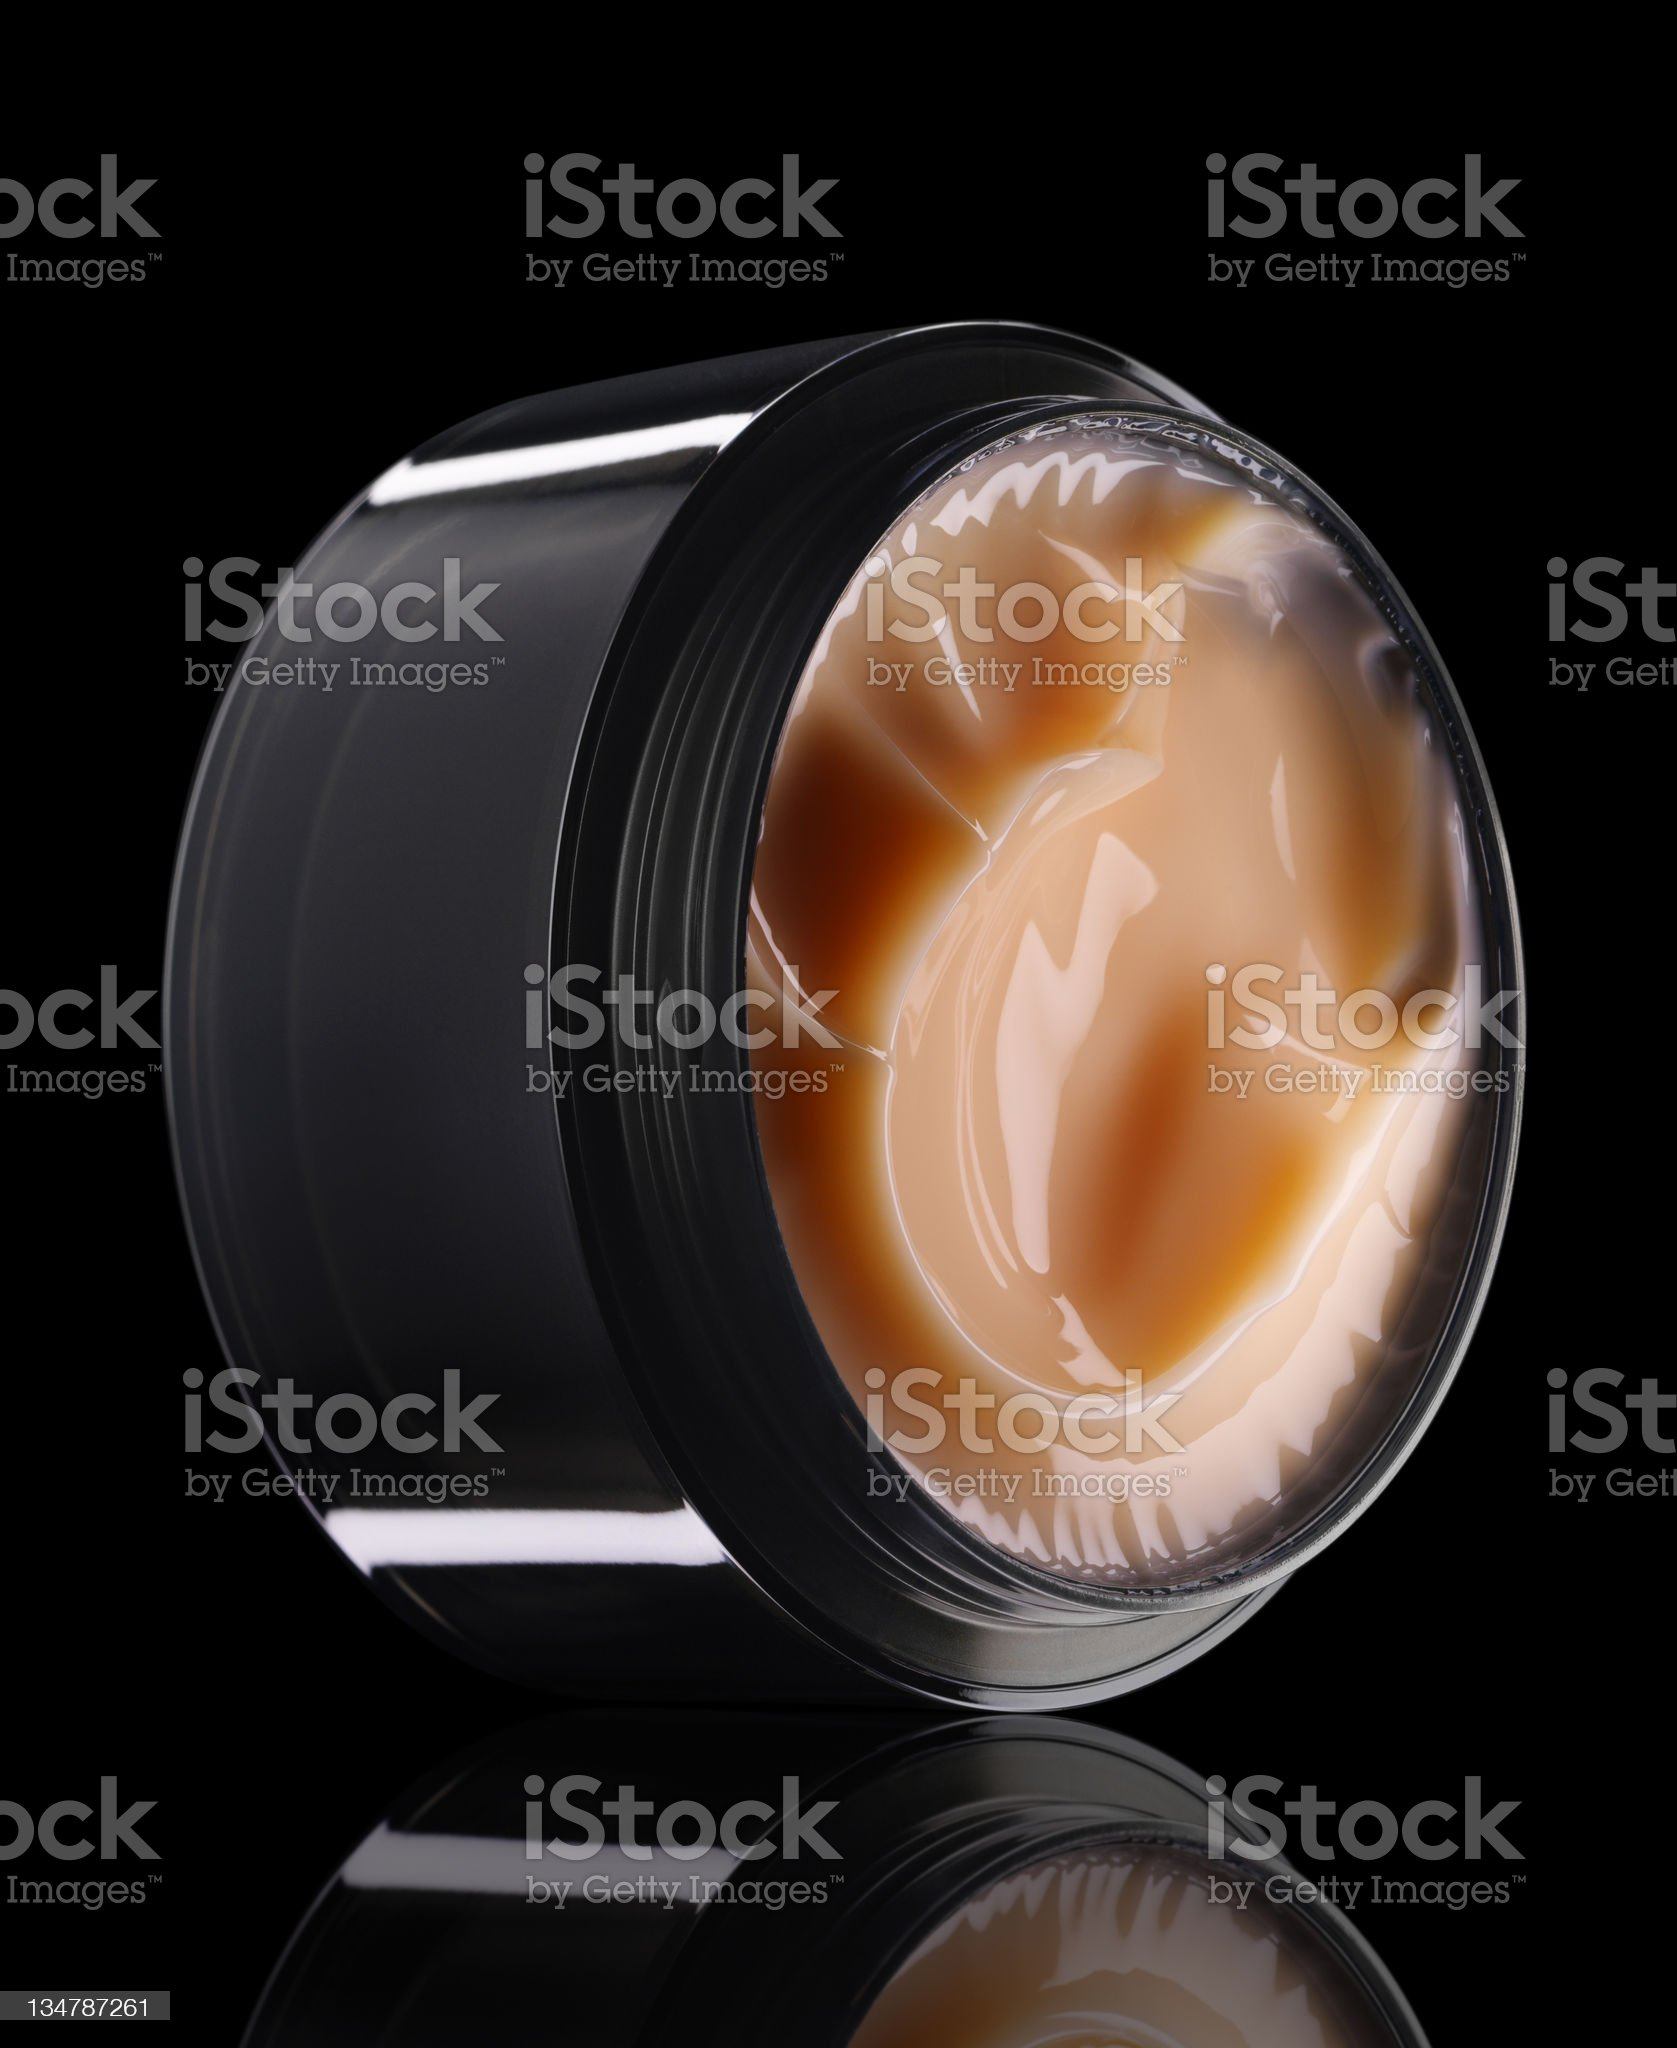 Skin cream royalty-free stock photo